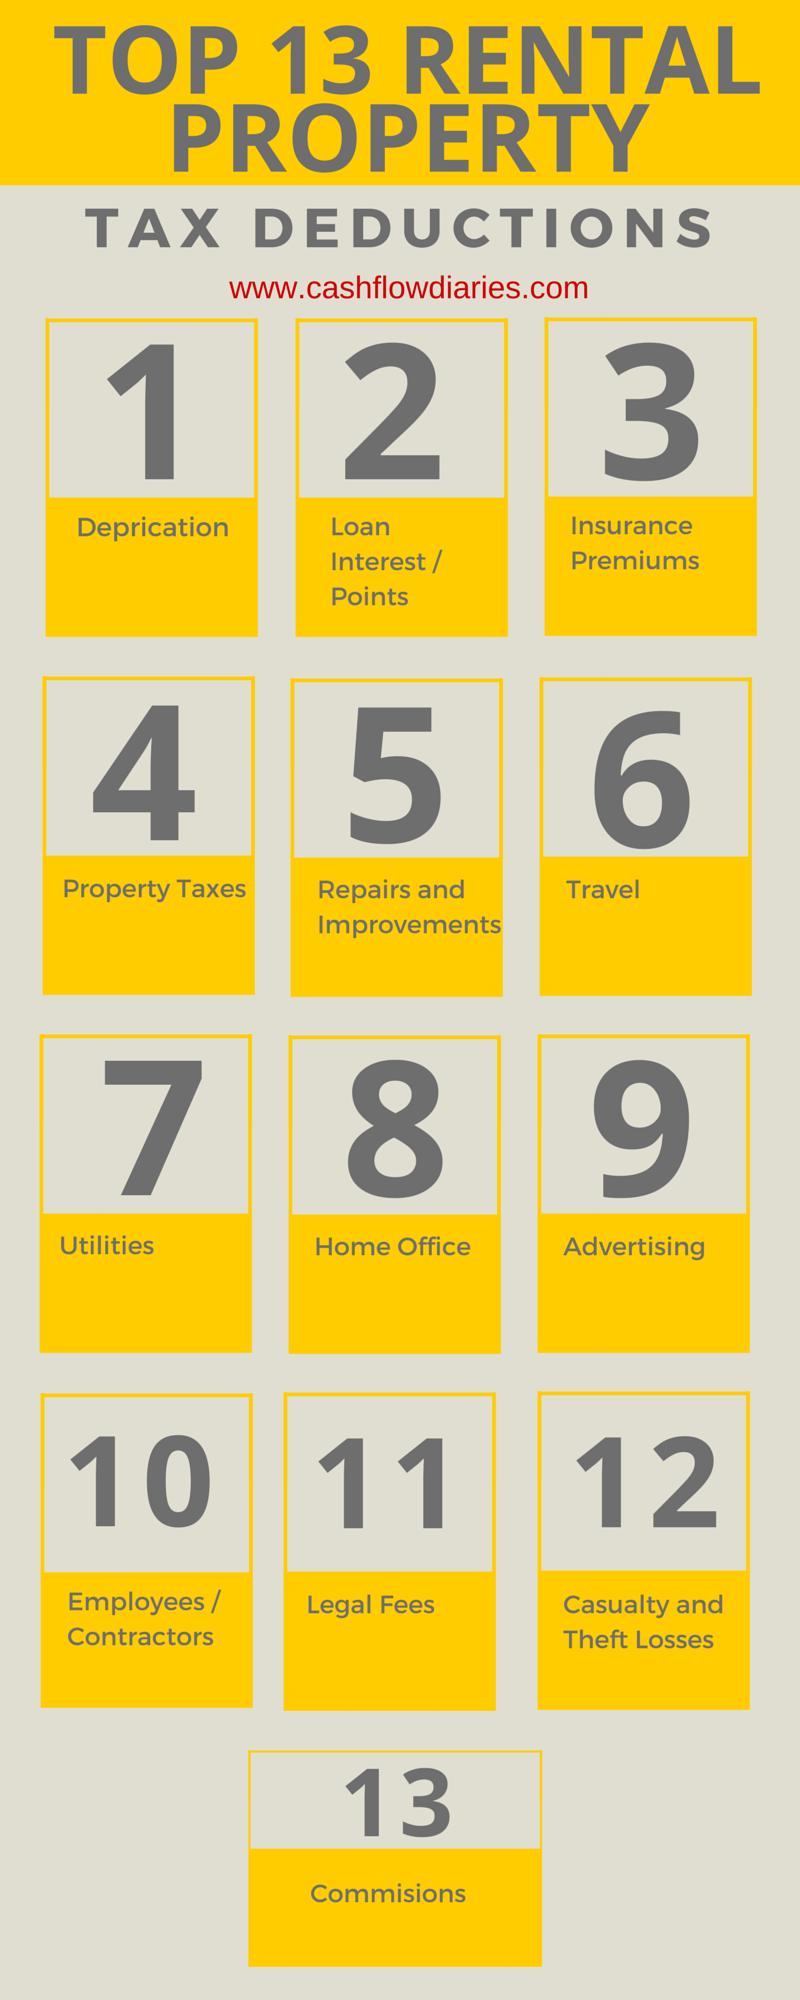 Top 13 Rental Property Tax Deductions Rental property